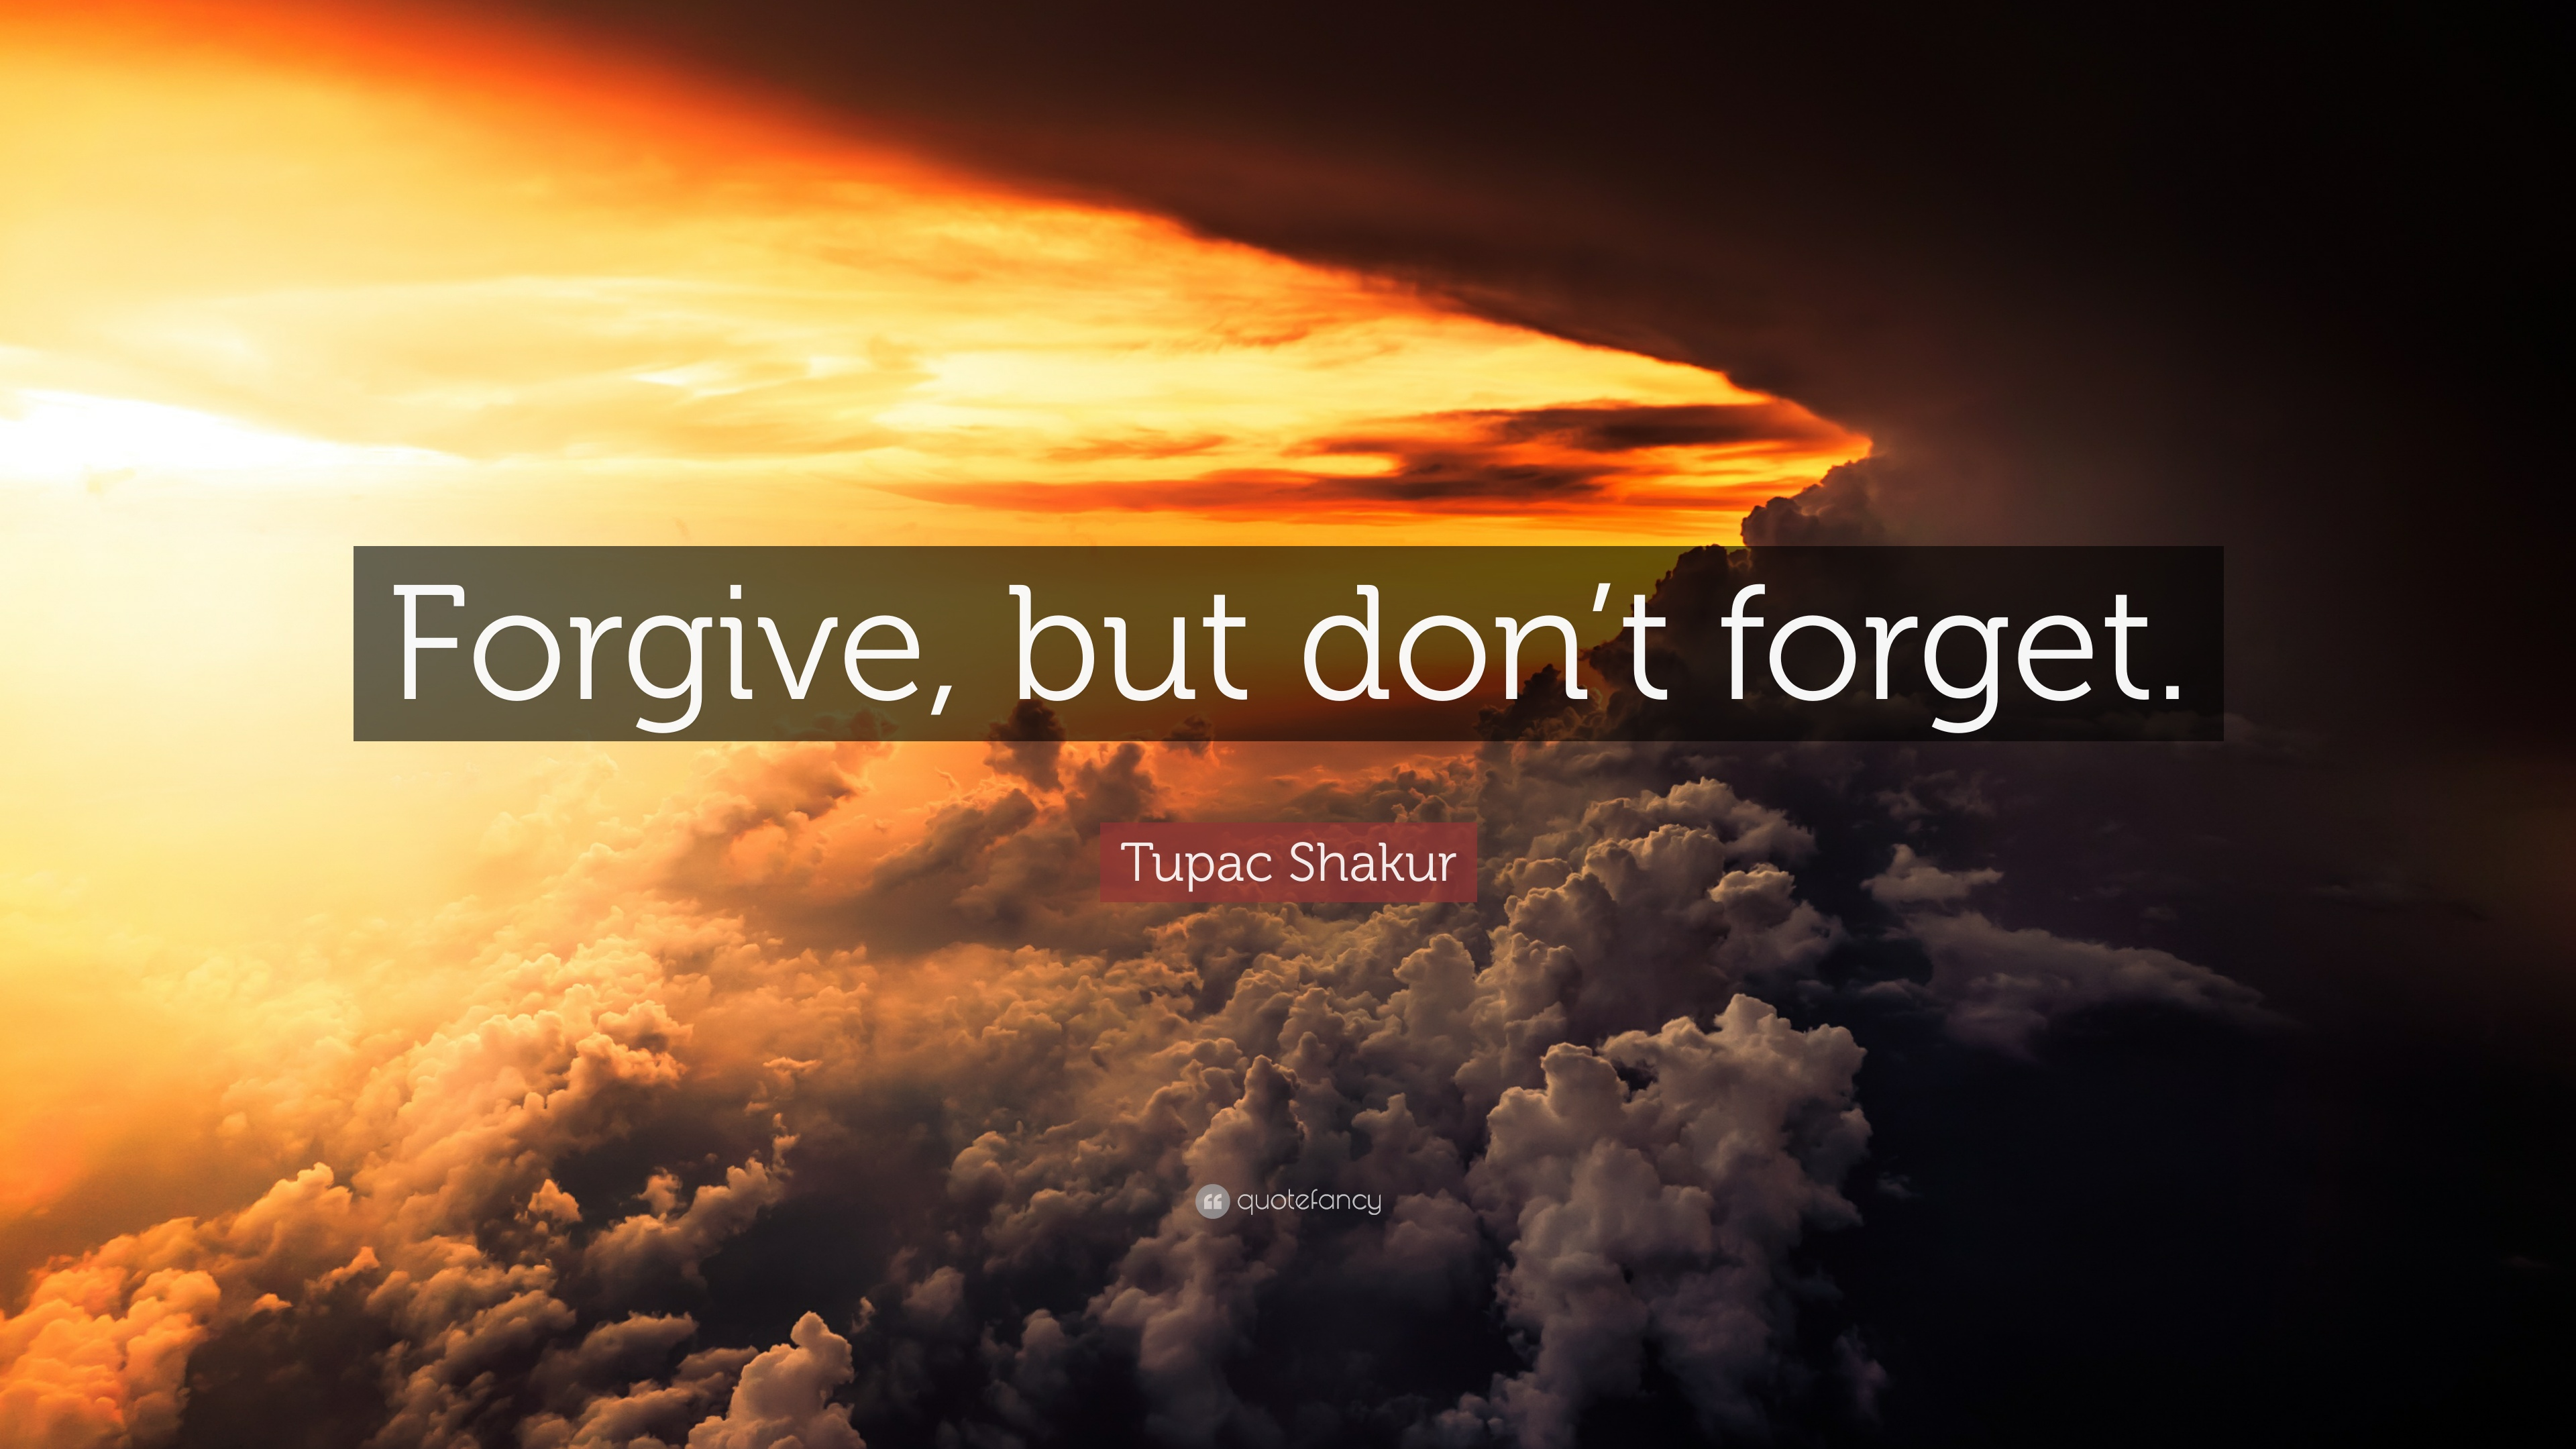 Dalai Lama Quotes Desktop Wallpaper Tupac Shakur Quote Forgive But Don T Forget 12